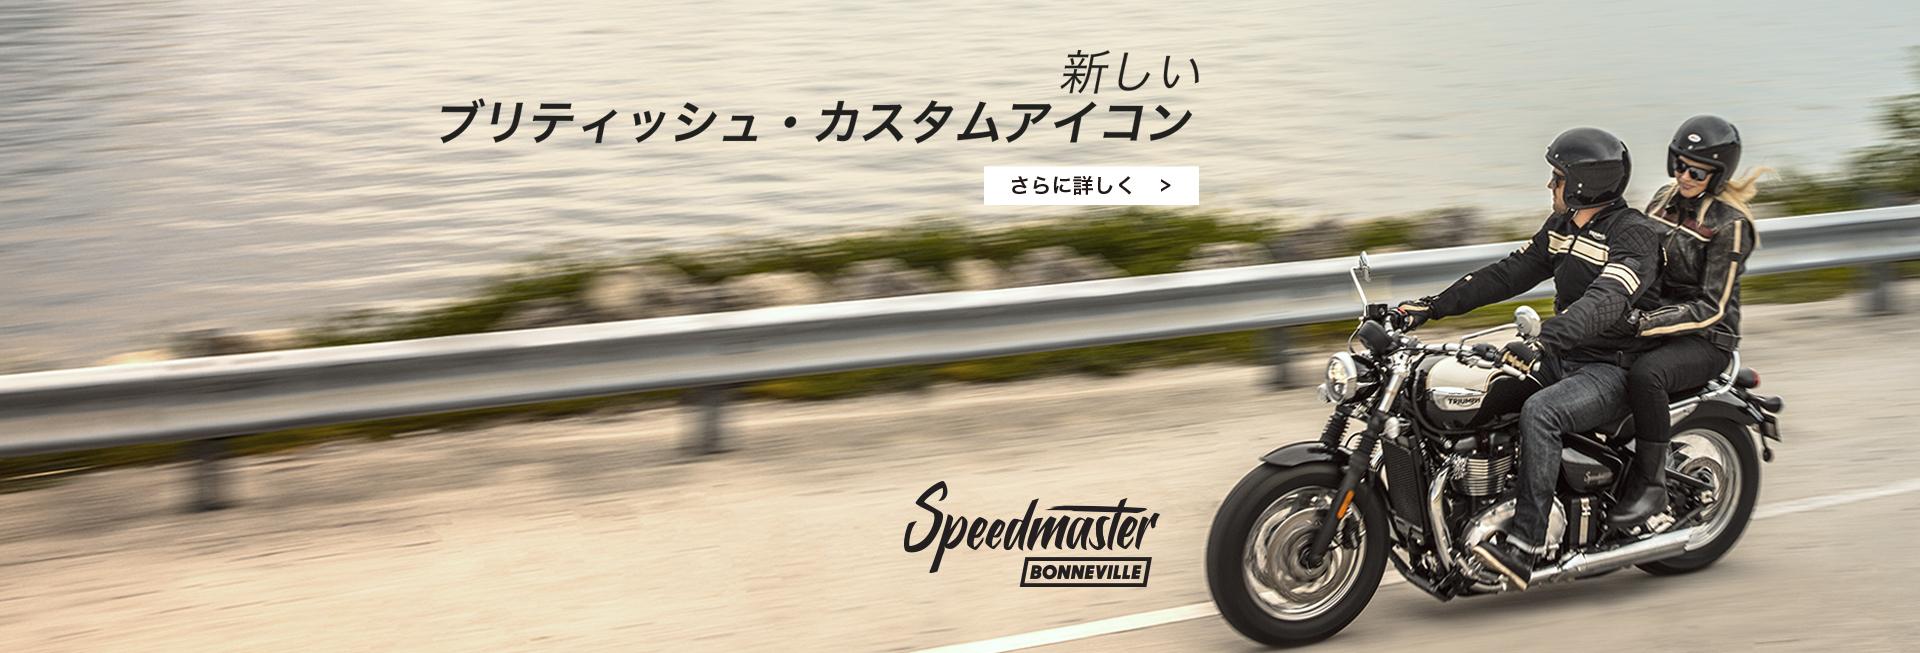 NEW ボンネビルスピードマスター Bonneville Speedmaster誕生!!